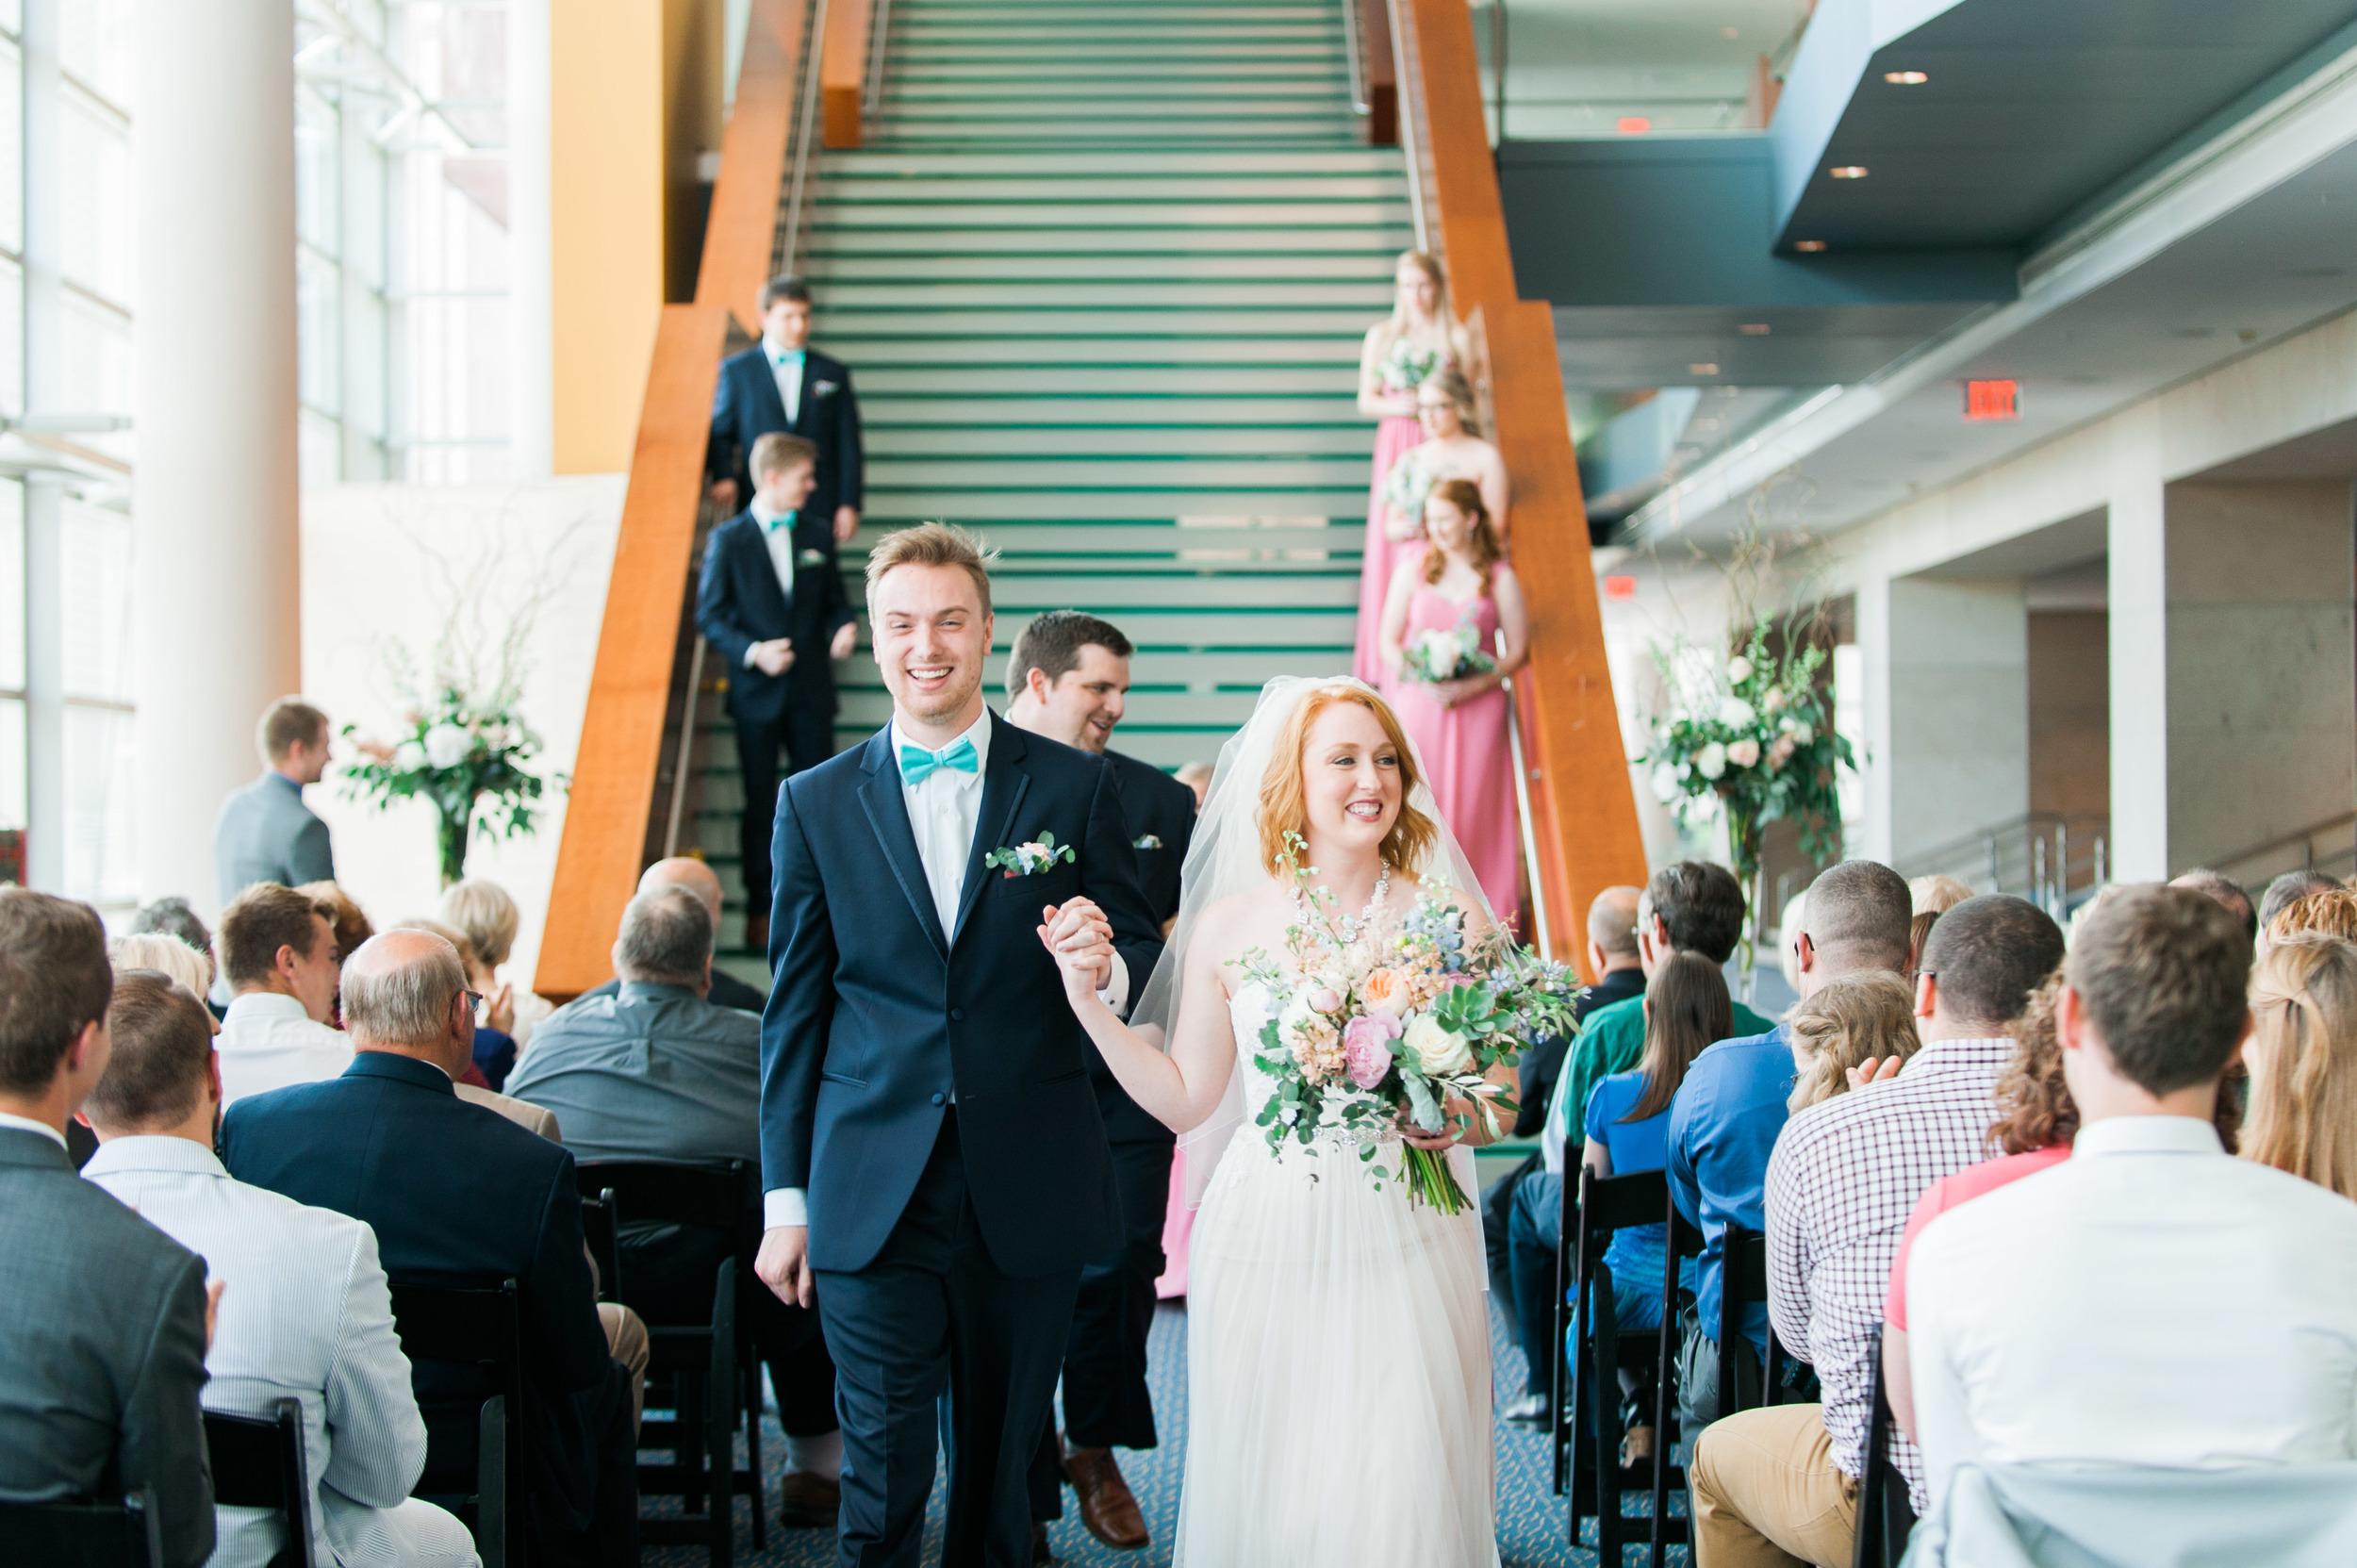 omaha-holland-arts-center-wedding-54.jpg